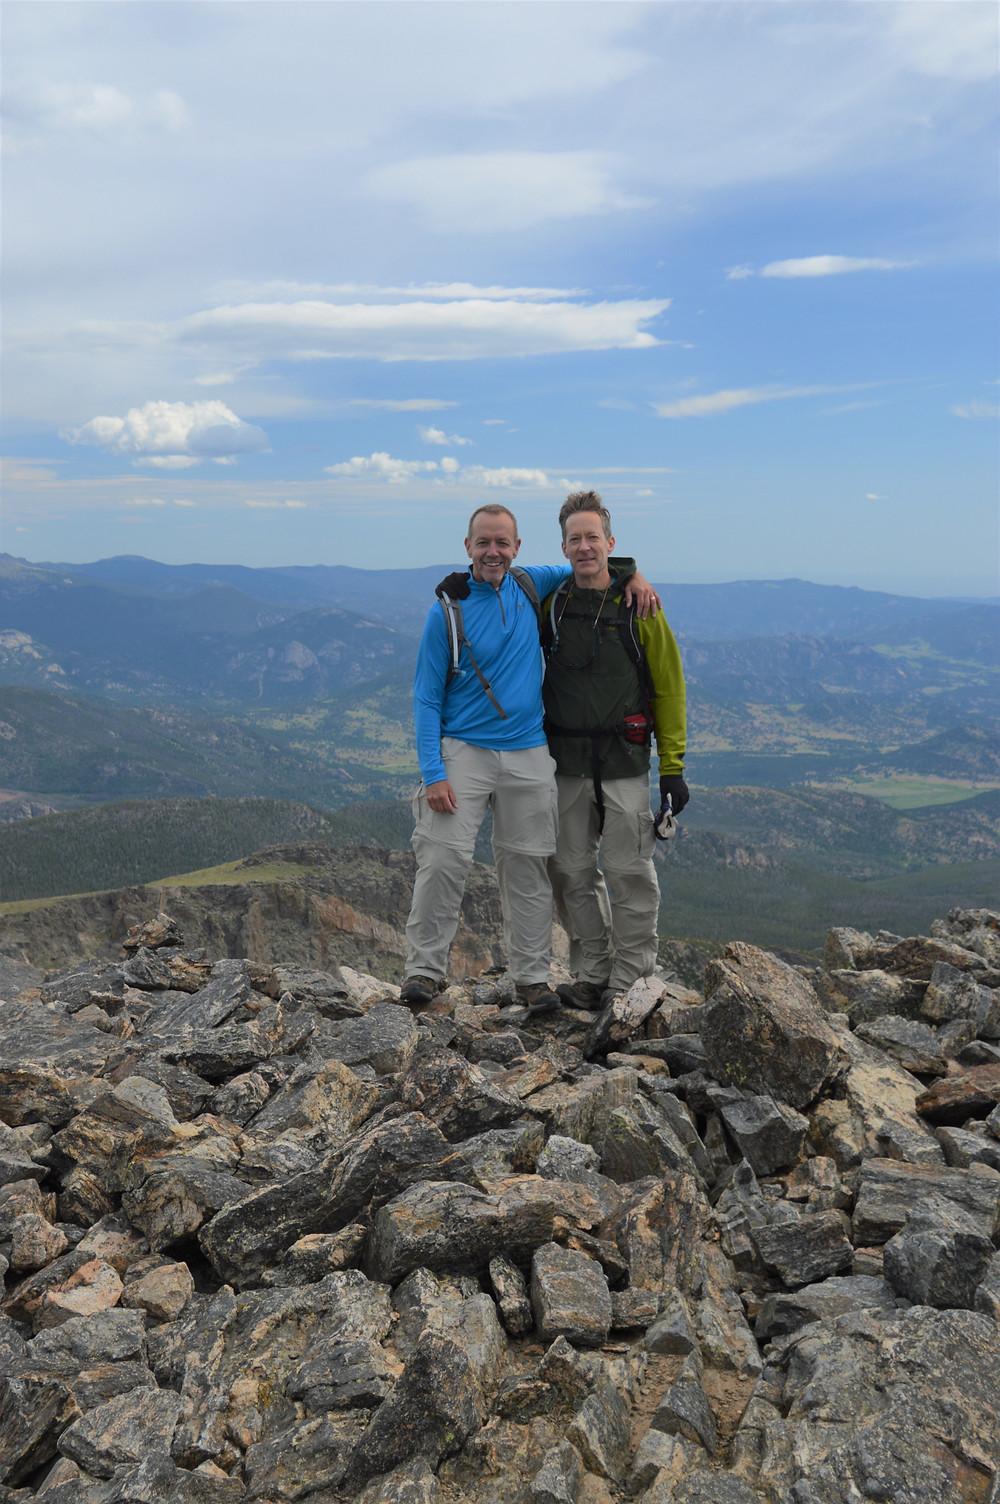 At the 12,713 foot summit of Hallett Peak in Rocky Mountain National Park